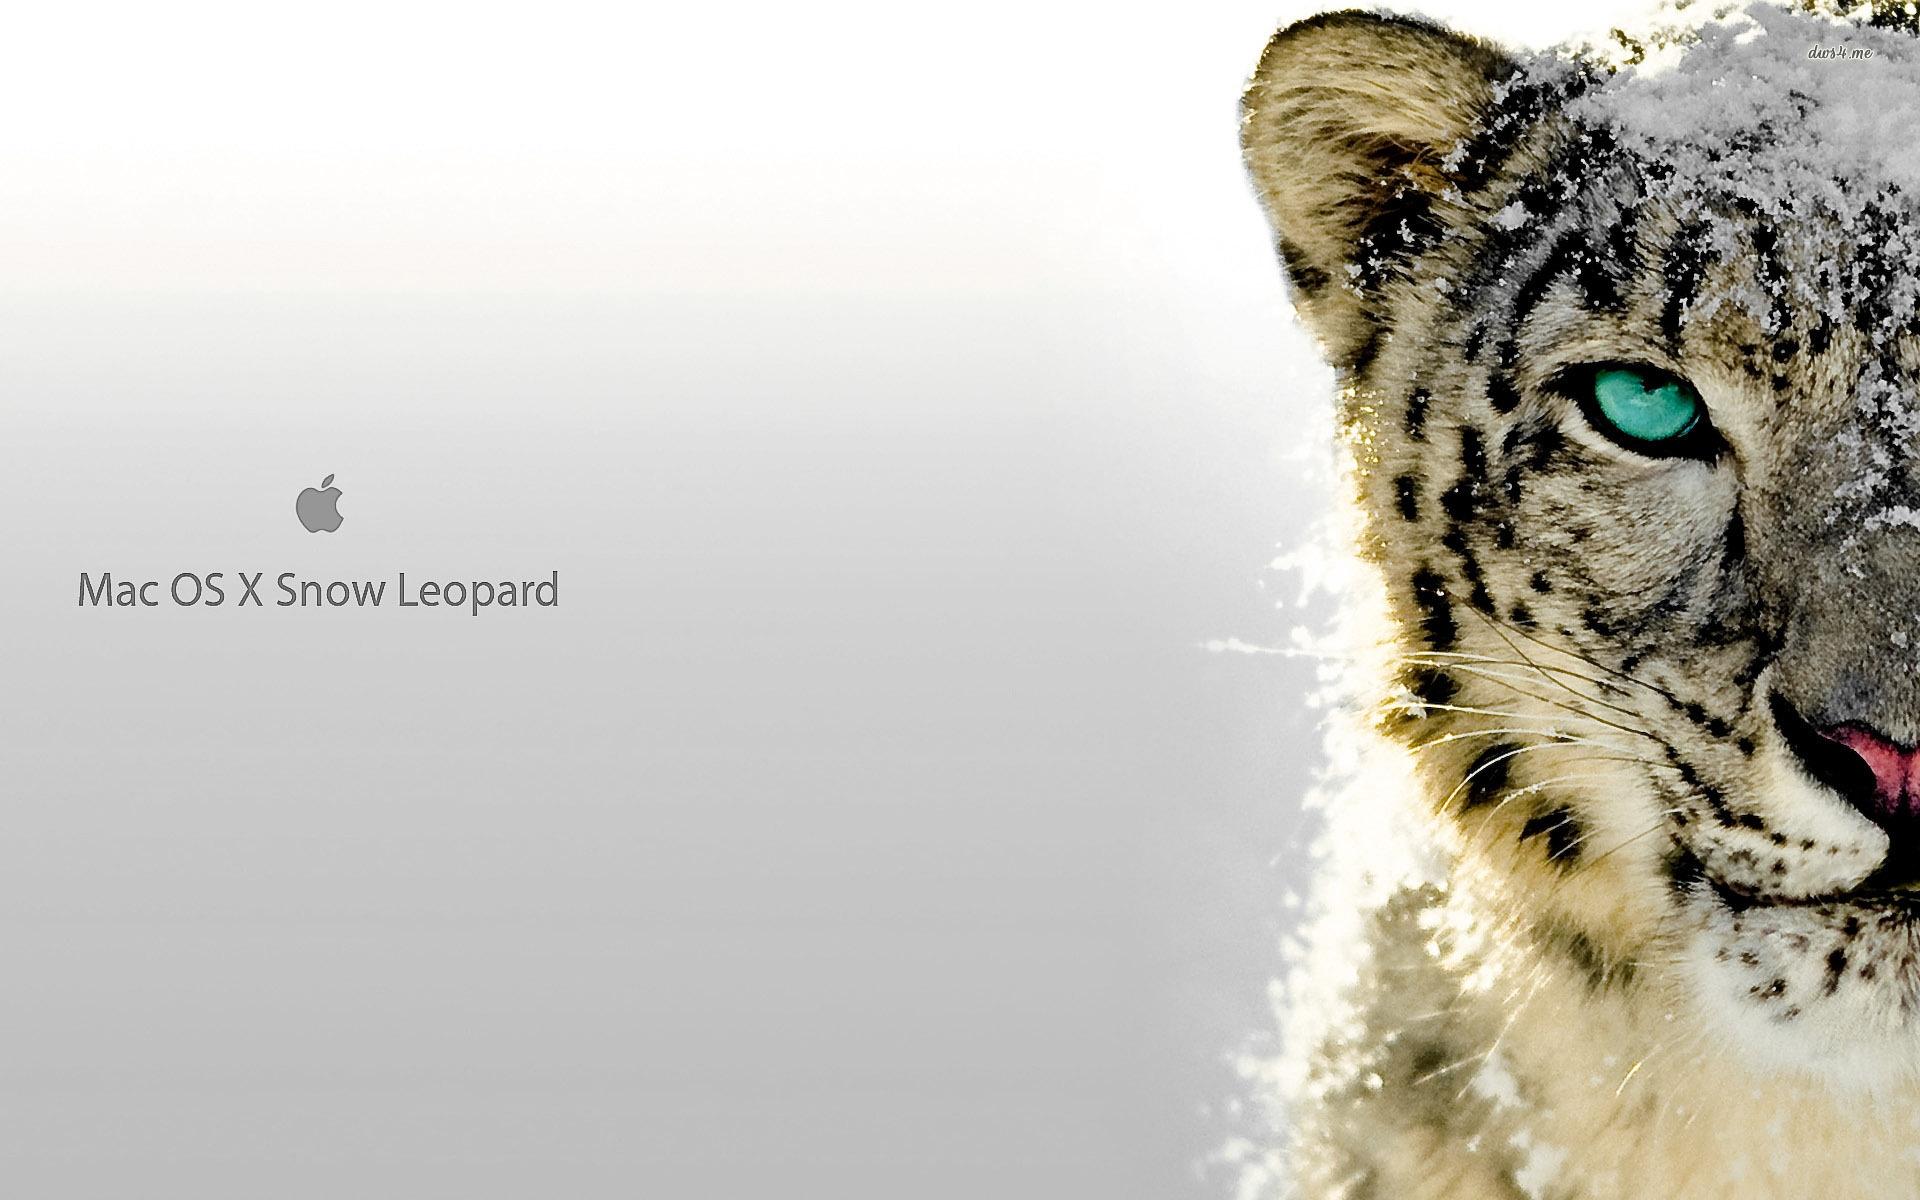 snow leopard mac os x hd desktop wallpaper background download